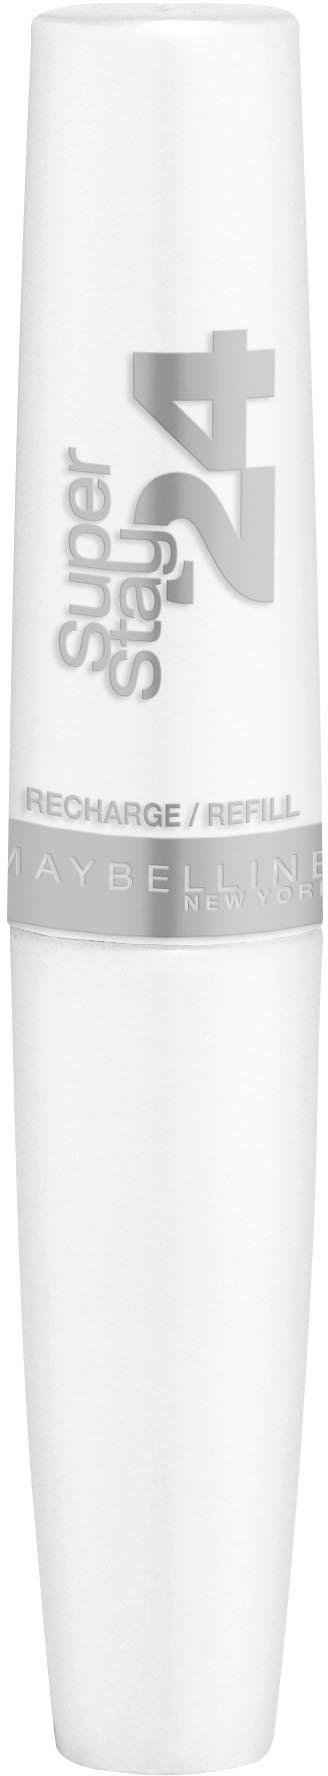 MAYBELLINE NEW YORK Lippenpflegestift »Superstay Pflegebalsam«